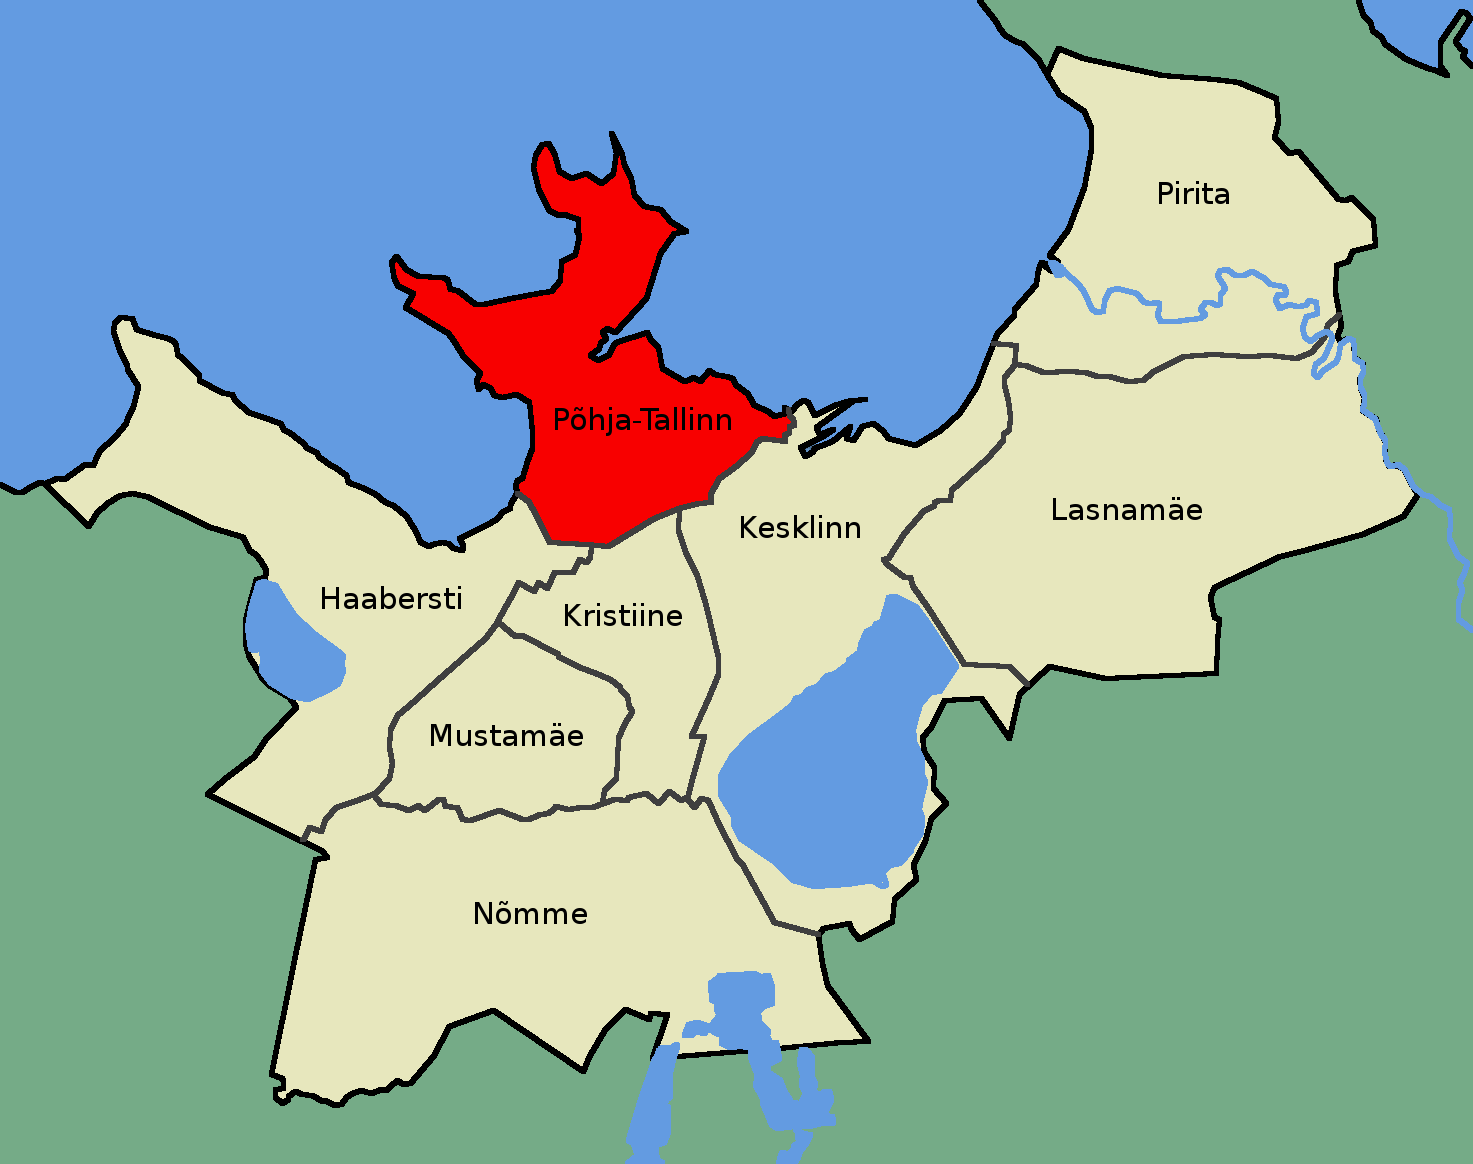 Карта района Пыхья-Таллин. Источник: ru.wikipedia.org . Автор: Mmh - собственная работа, CC BY-SA 3.0, https://commons.wikimedia.org/w/index.php?curid=8049489 .